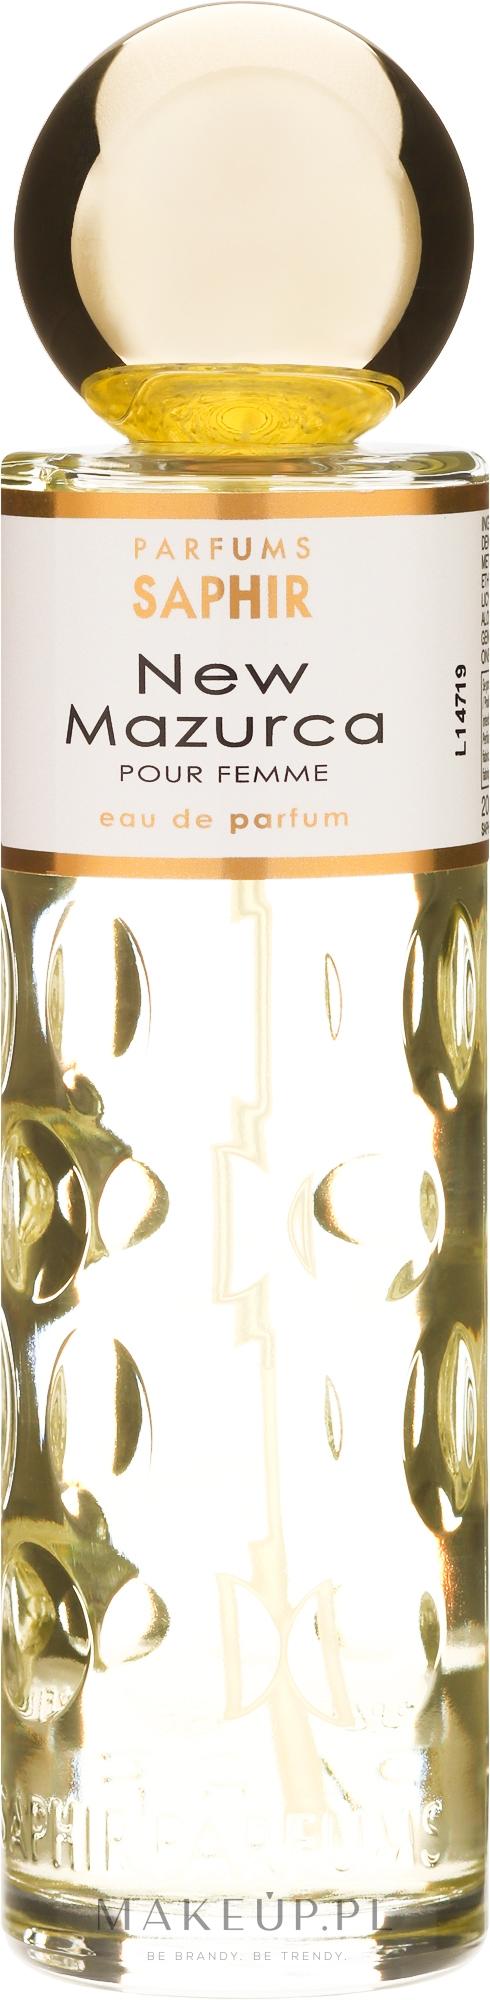 parfums saphir new mazurca pour femme